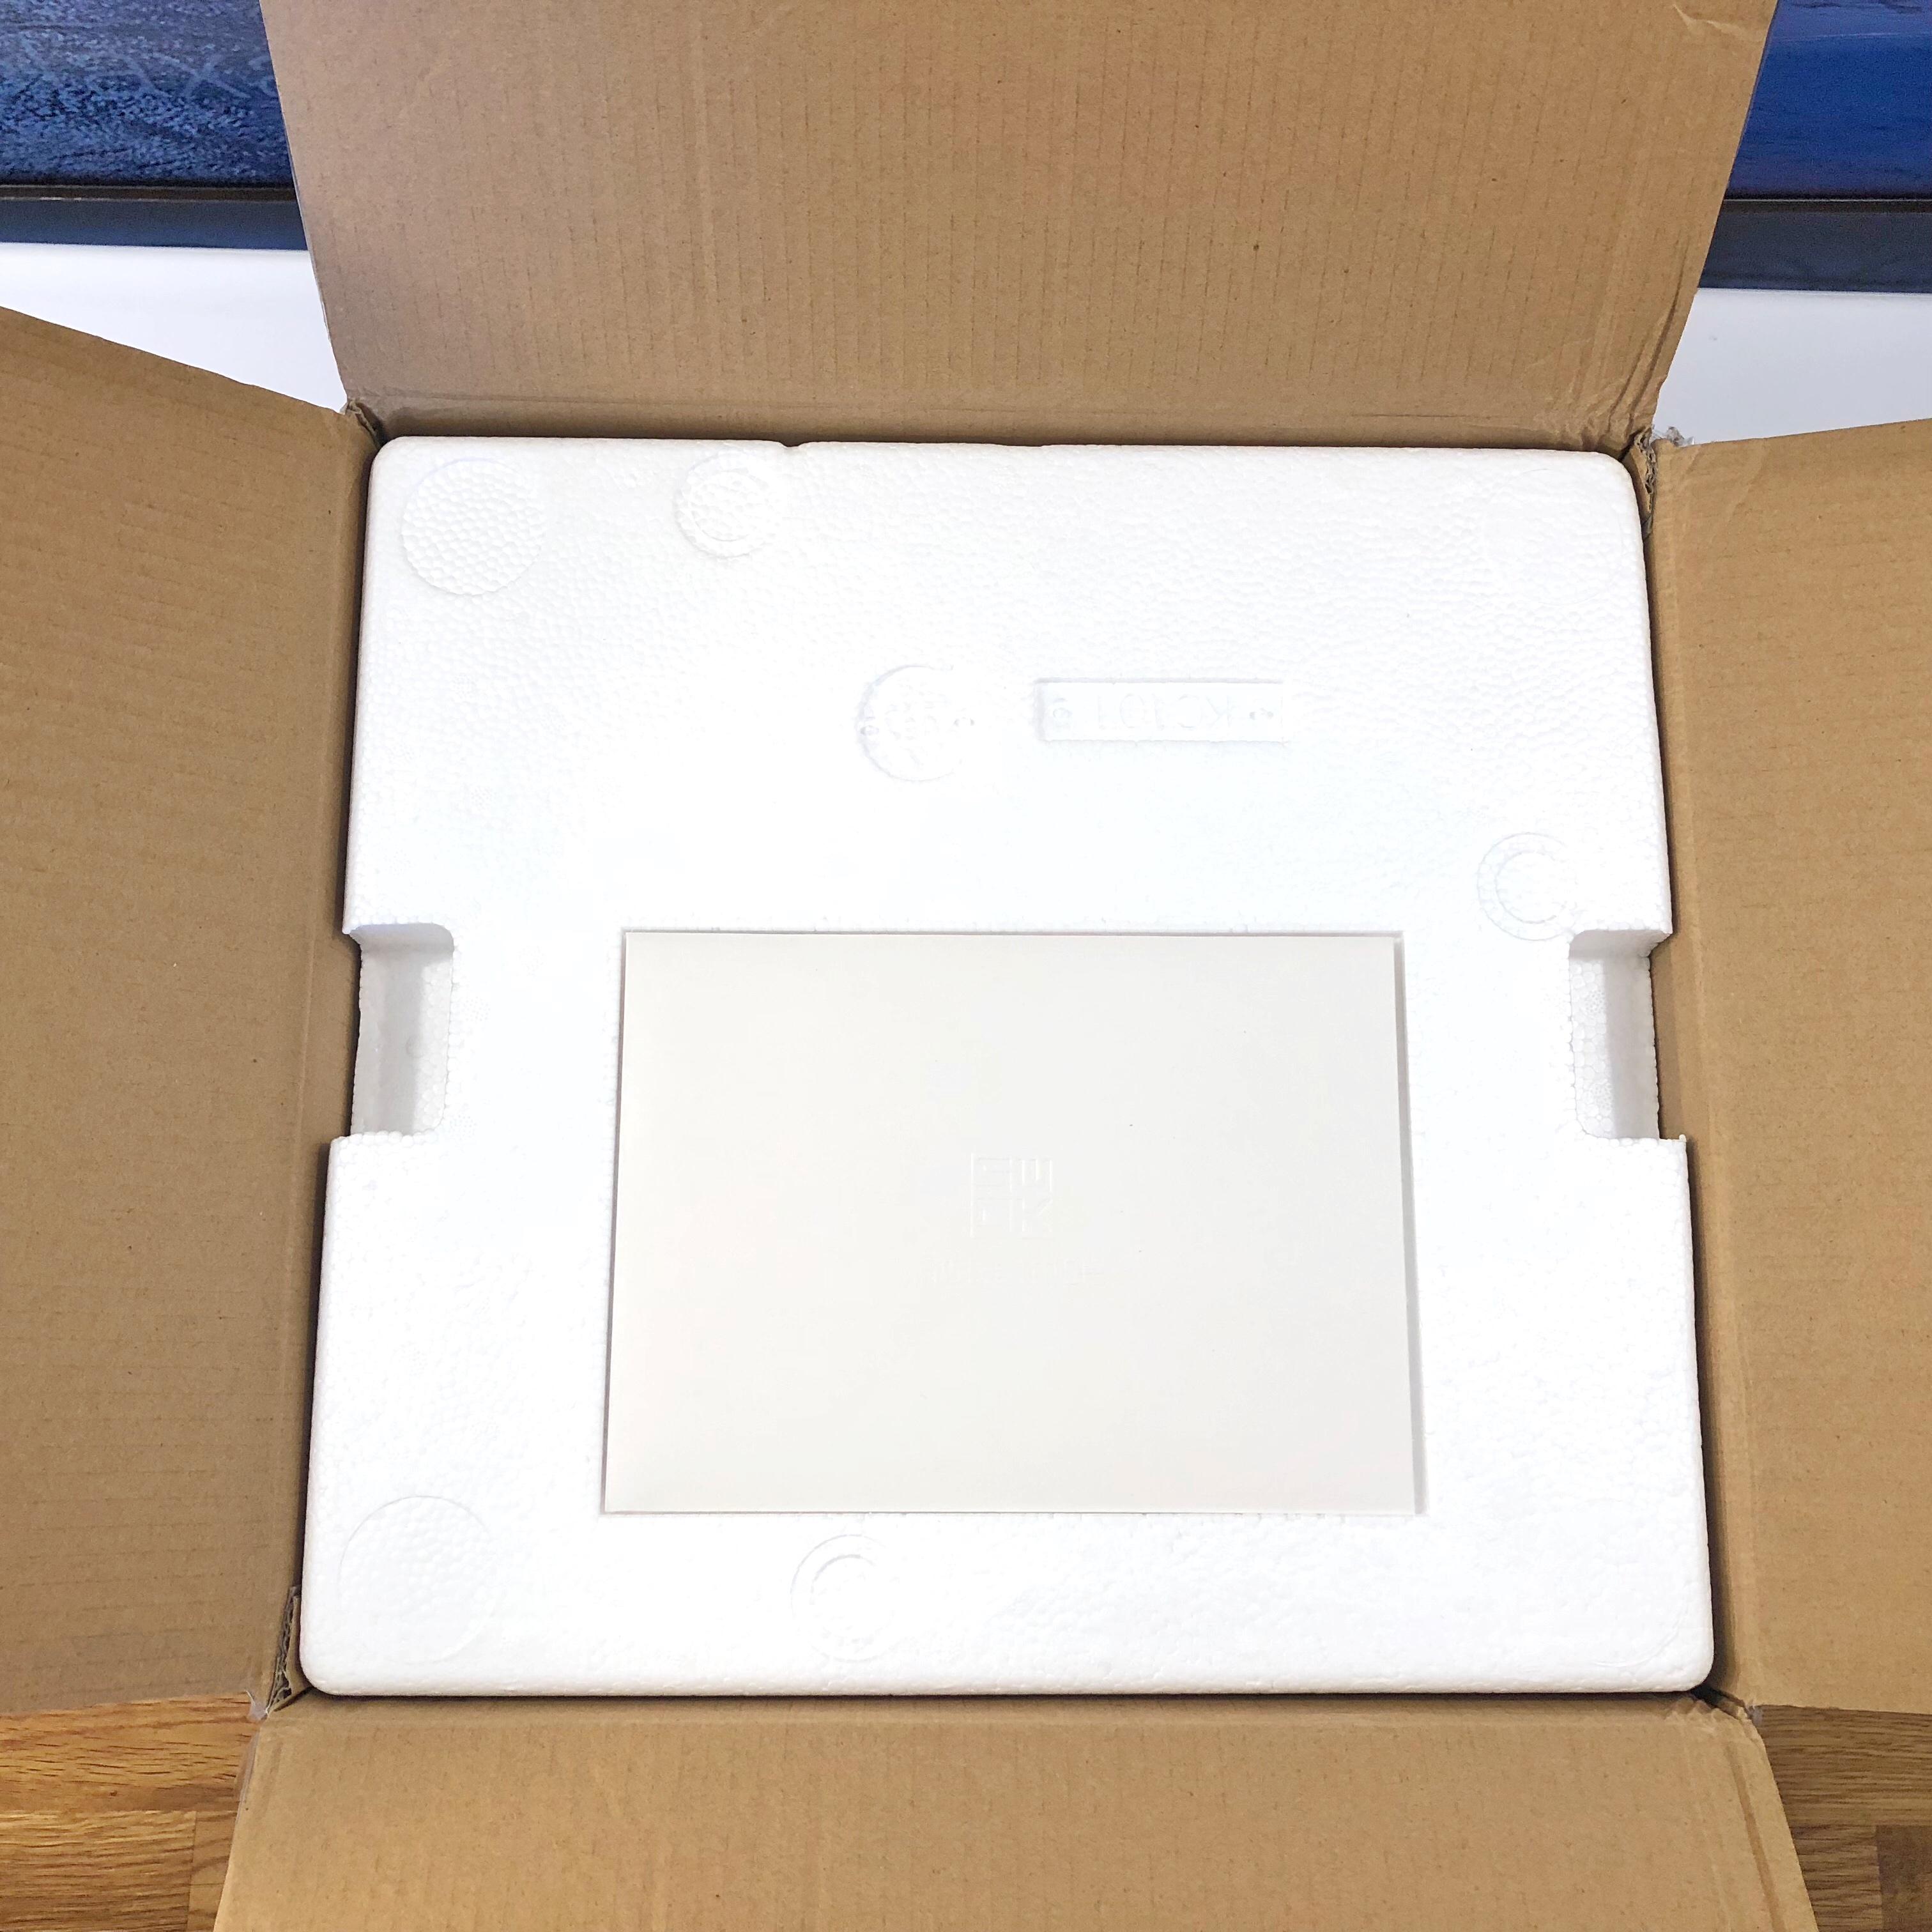 Nirkabel Xiaomi SWDK vacuum cleaner